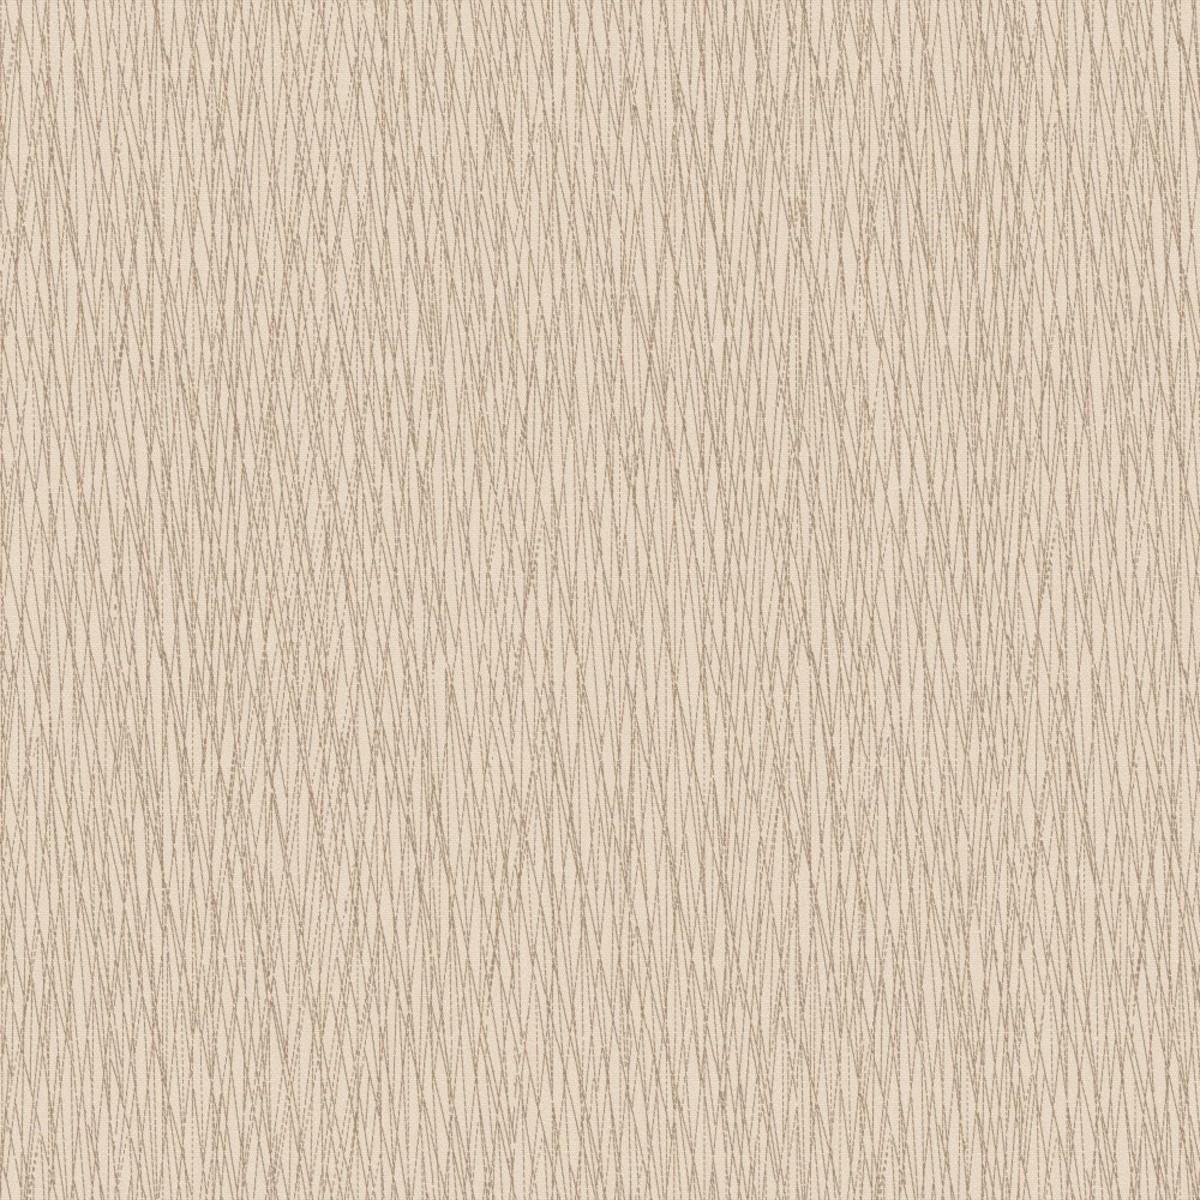 Обои флизелиновые Victoria Stenova System коричневые 1.06 м 998616